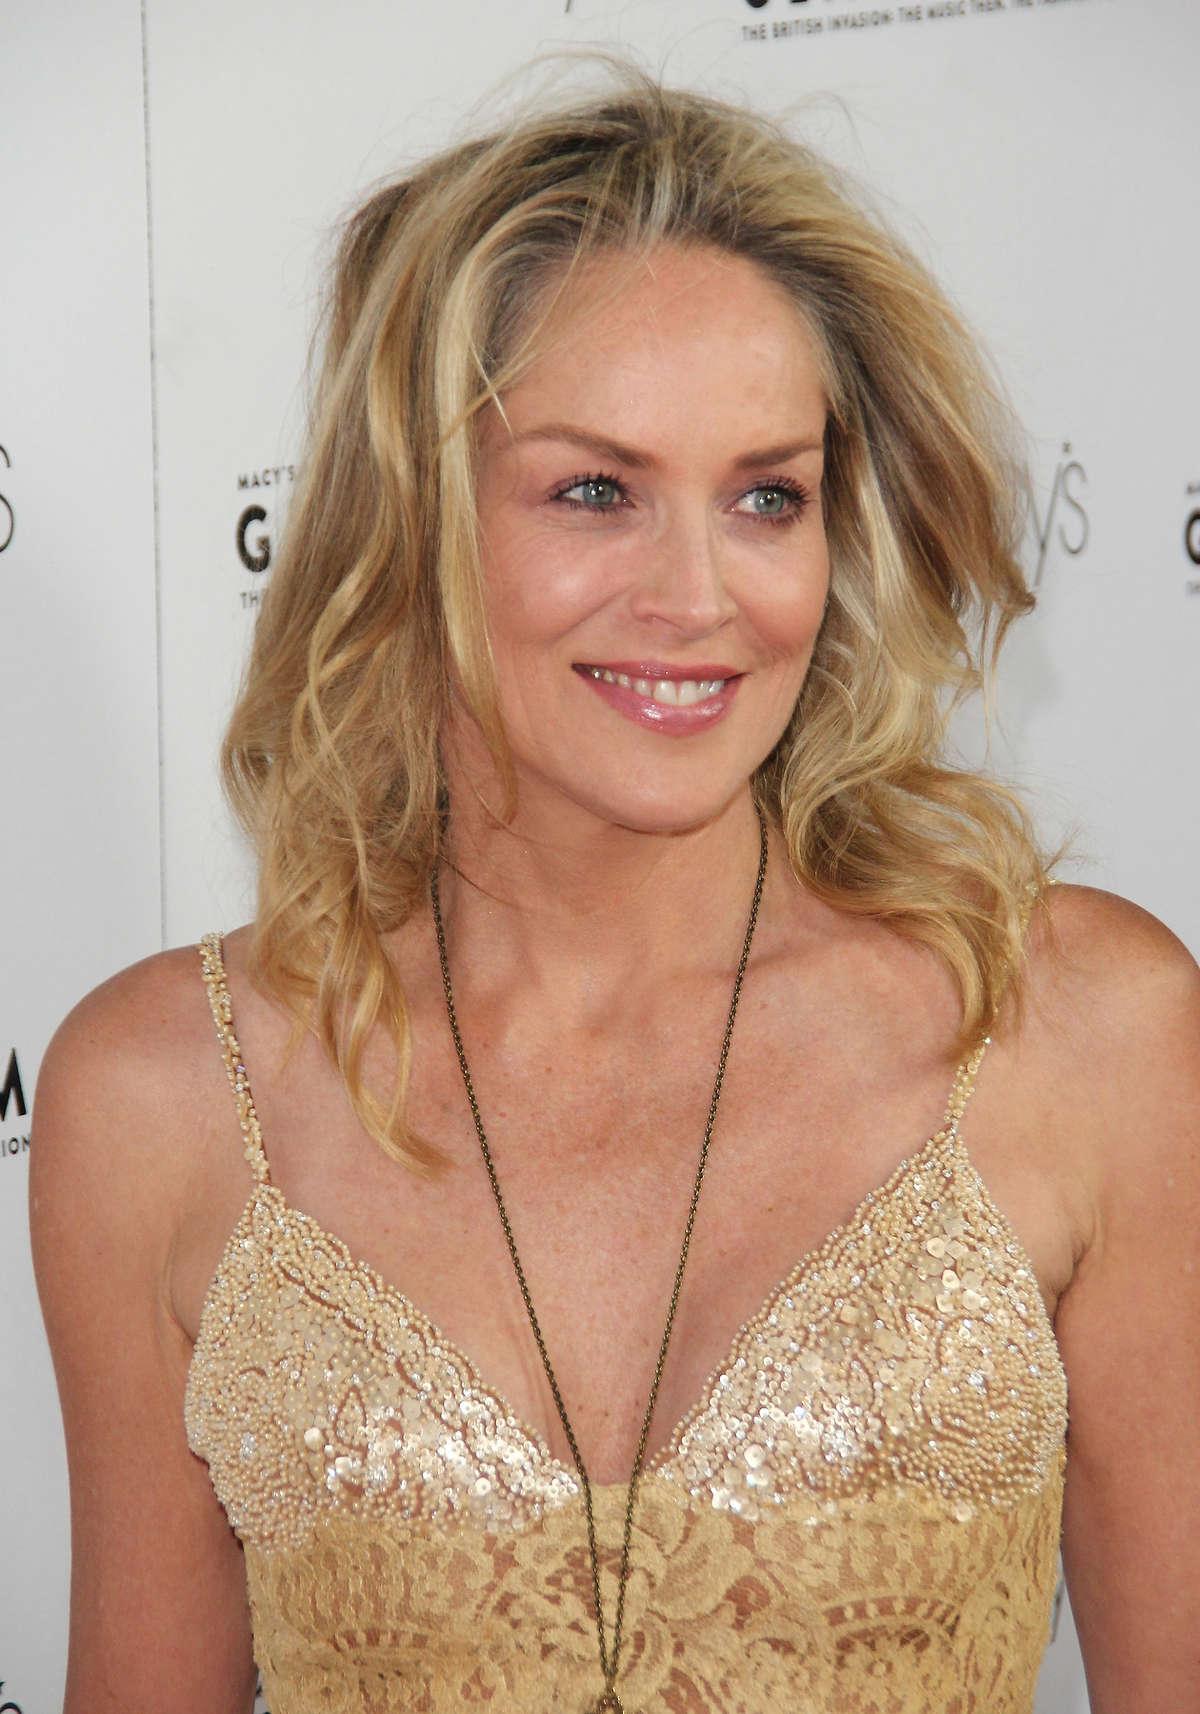 غریزه Sharon Stone at Glamorama - Full Size Pictures : GotCeleb